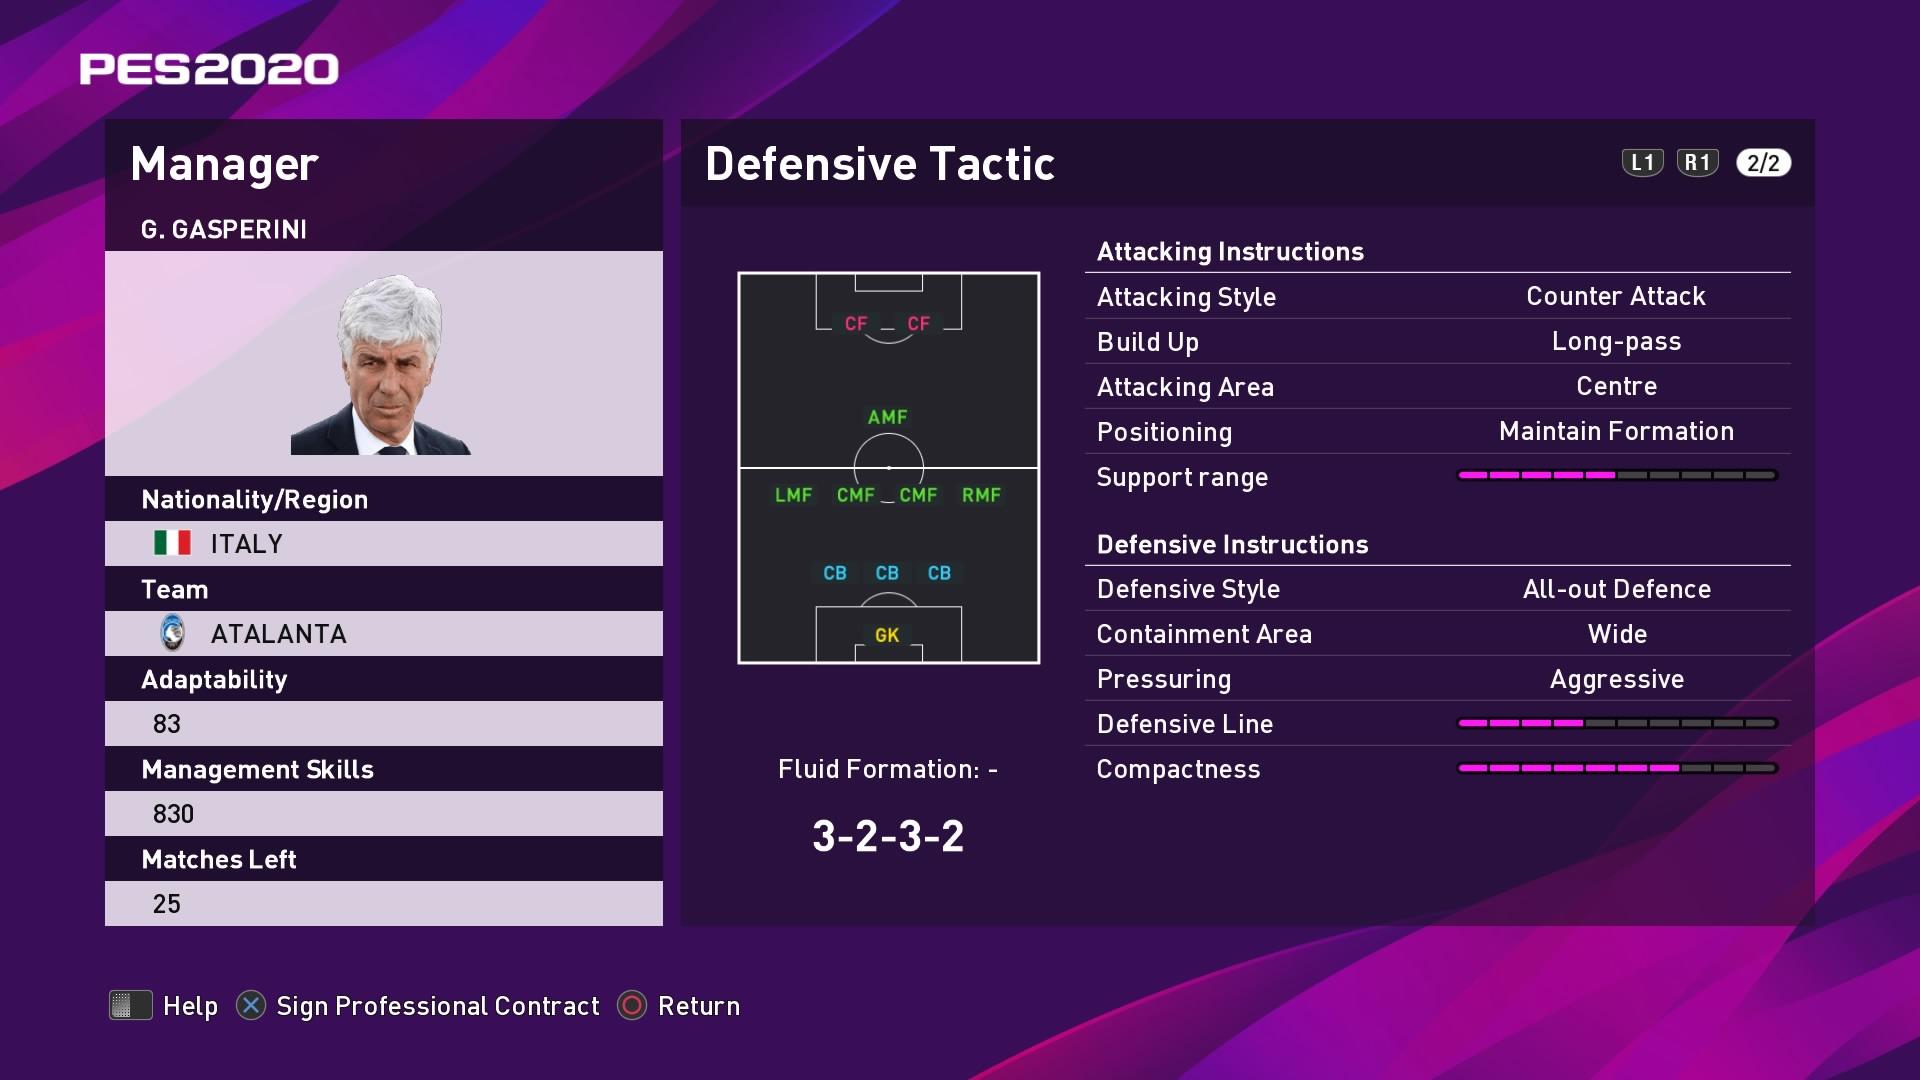 G. Gasperini (3) (Gian Piero Gasperini) Defensive Tactic in PES 2020 myClub